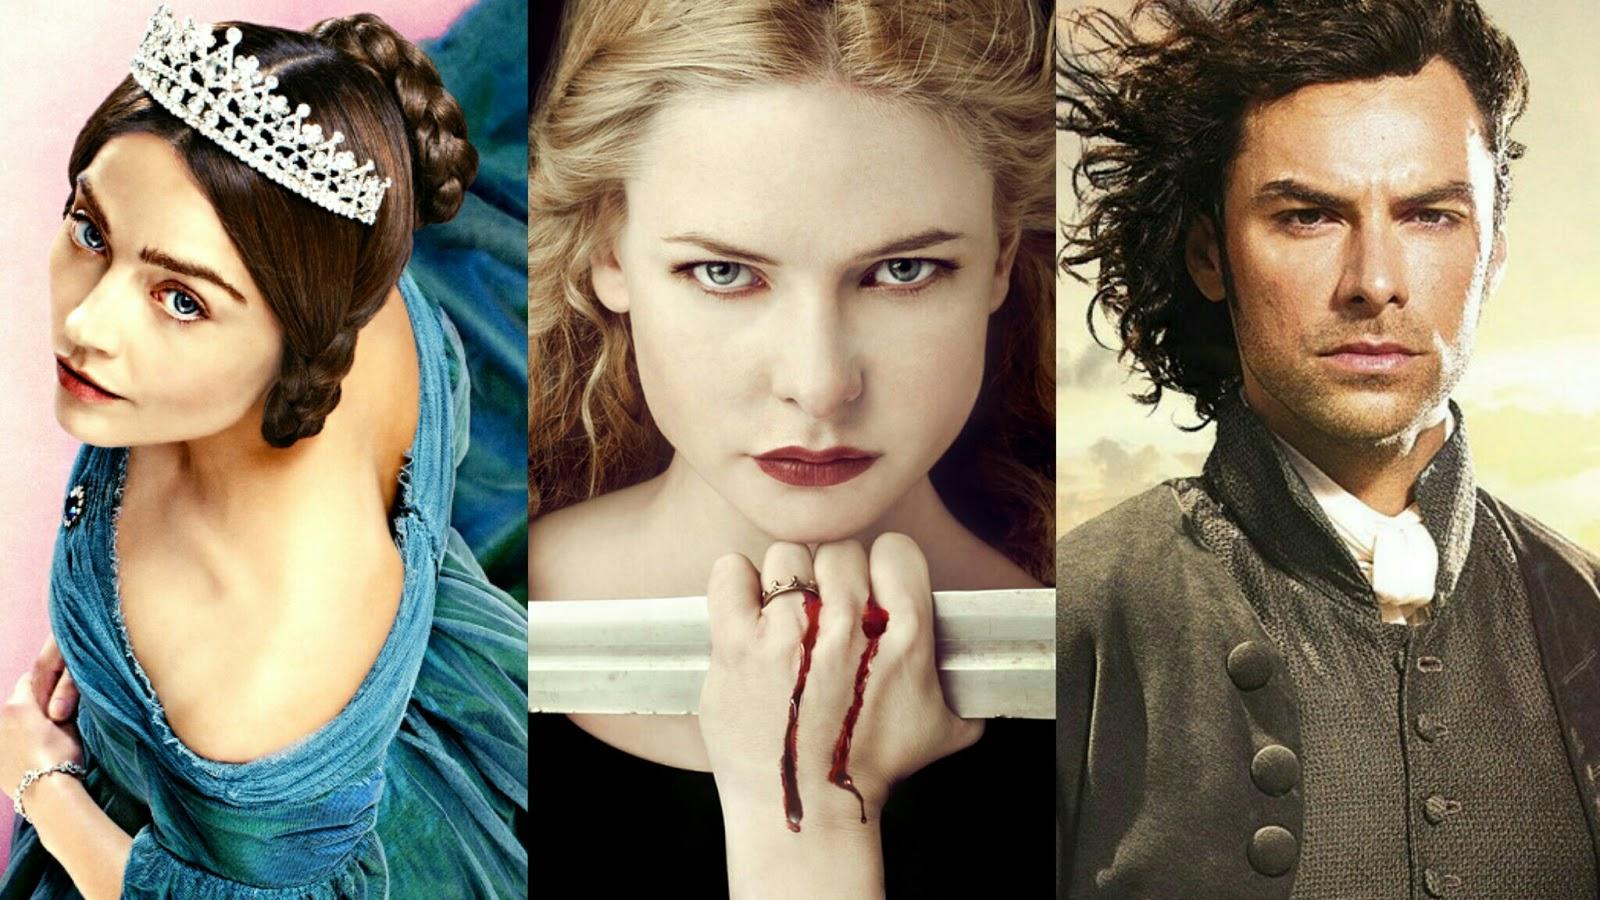 Eclectic Pop - TV's Top 20 Costuma Drama Soundtracks - Victoria, The White Queen, Poldark